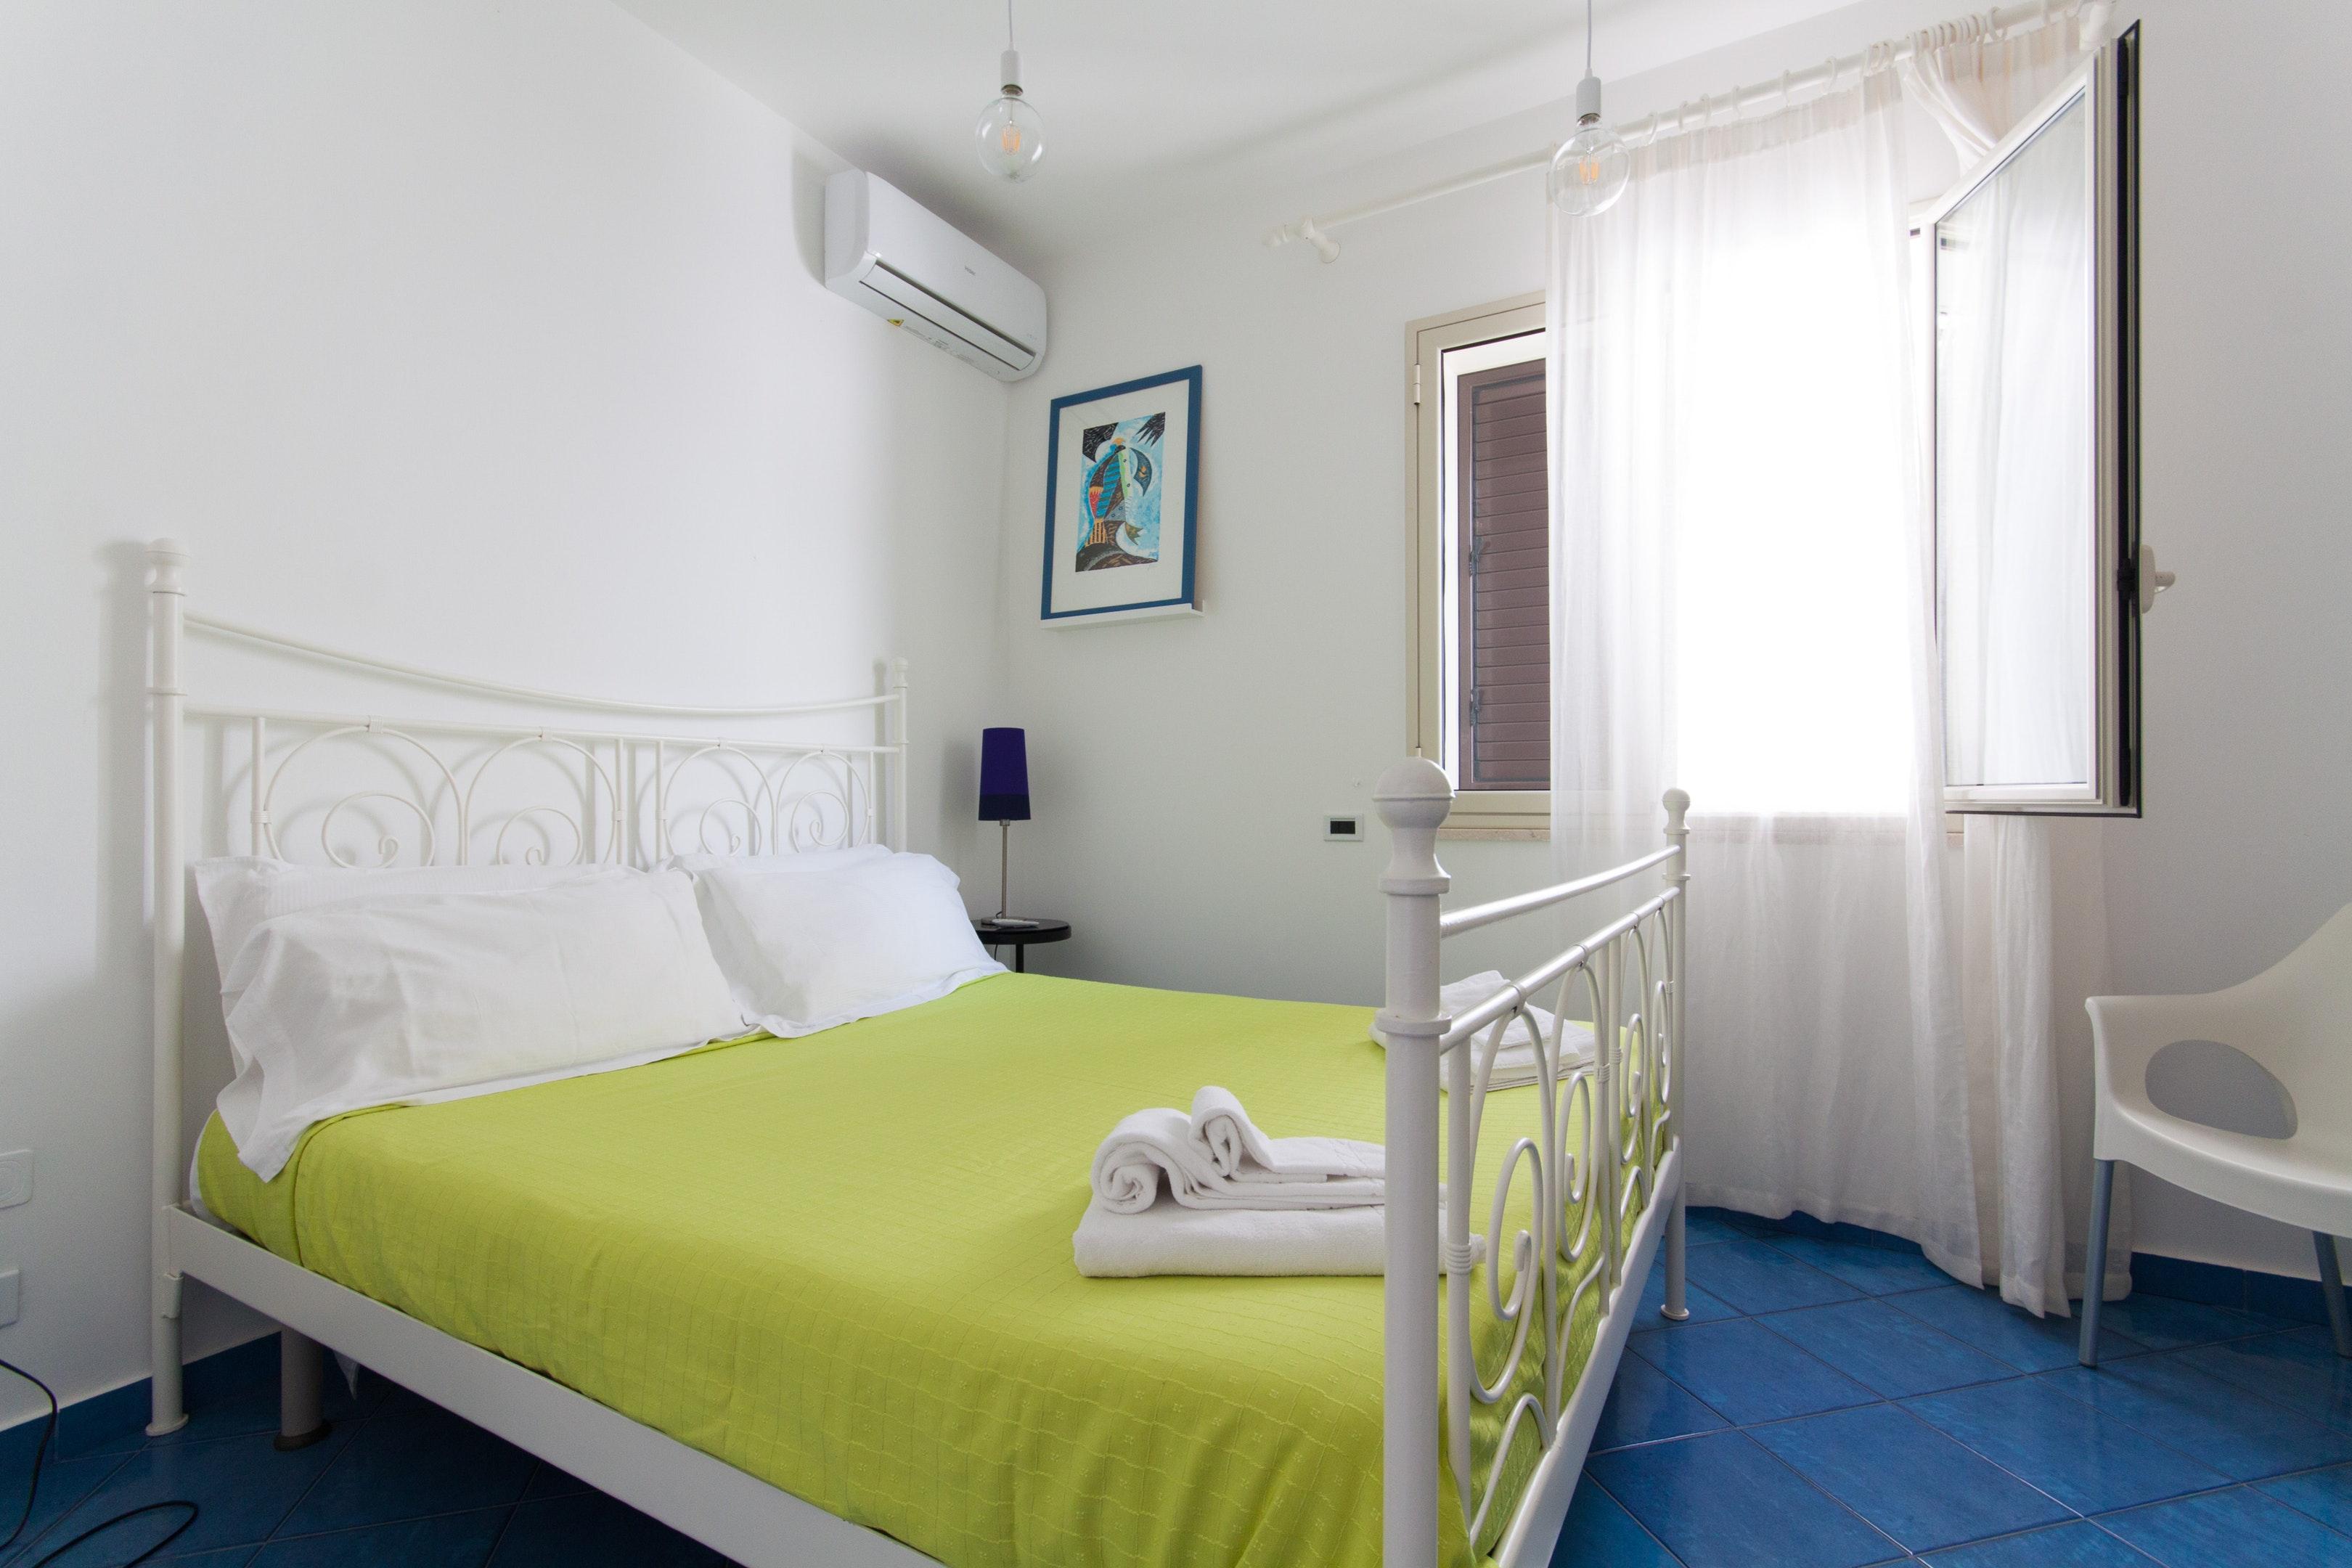 Holiday apartment Wohnung mit 3 Schlafzimmern in Piano di Trappeto mit herrlichem Meerblick, möblierter Terr (2271436), Balestrate, Palermo, Sicily, Italy, picture 18